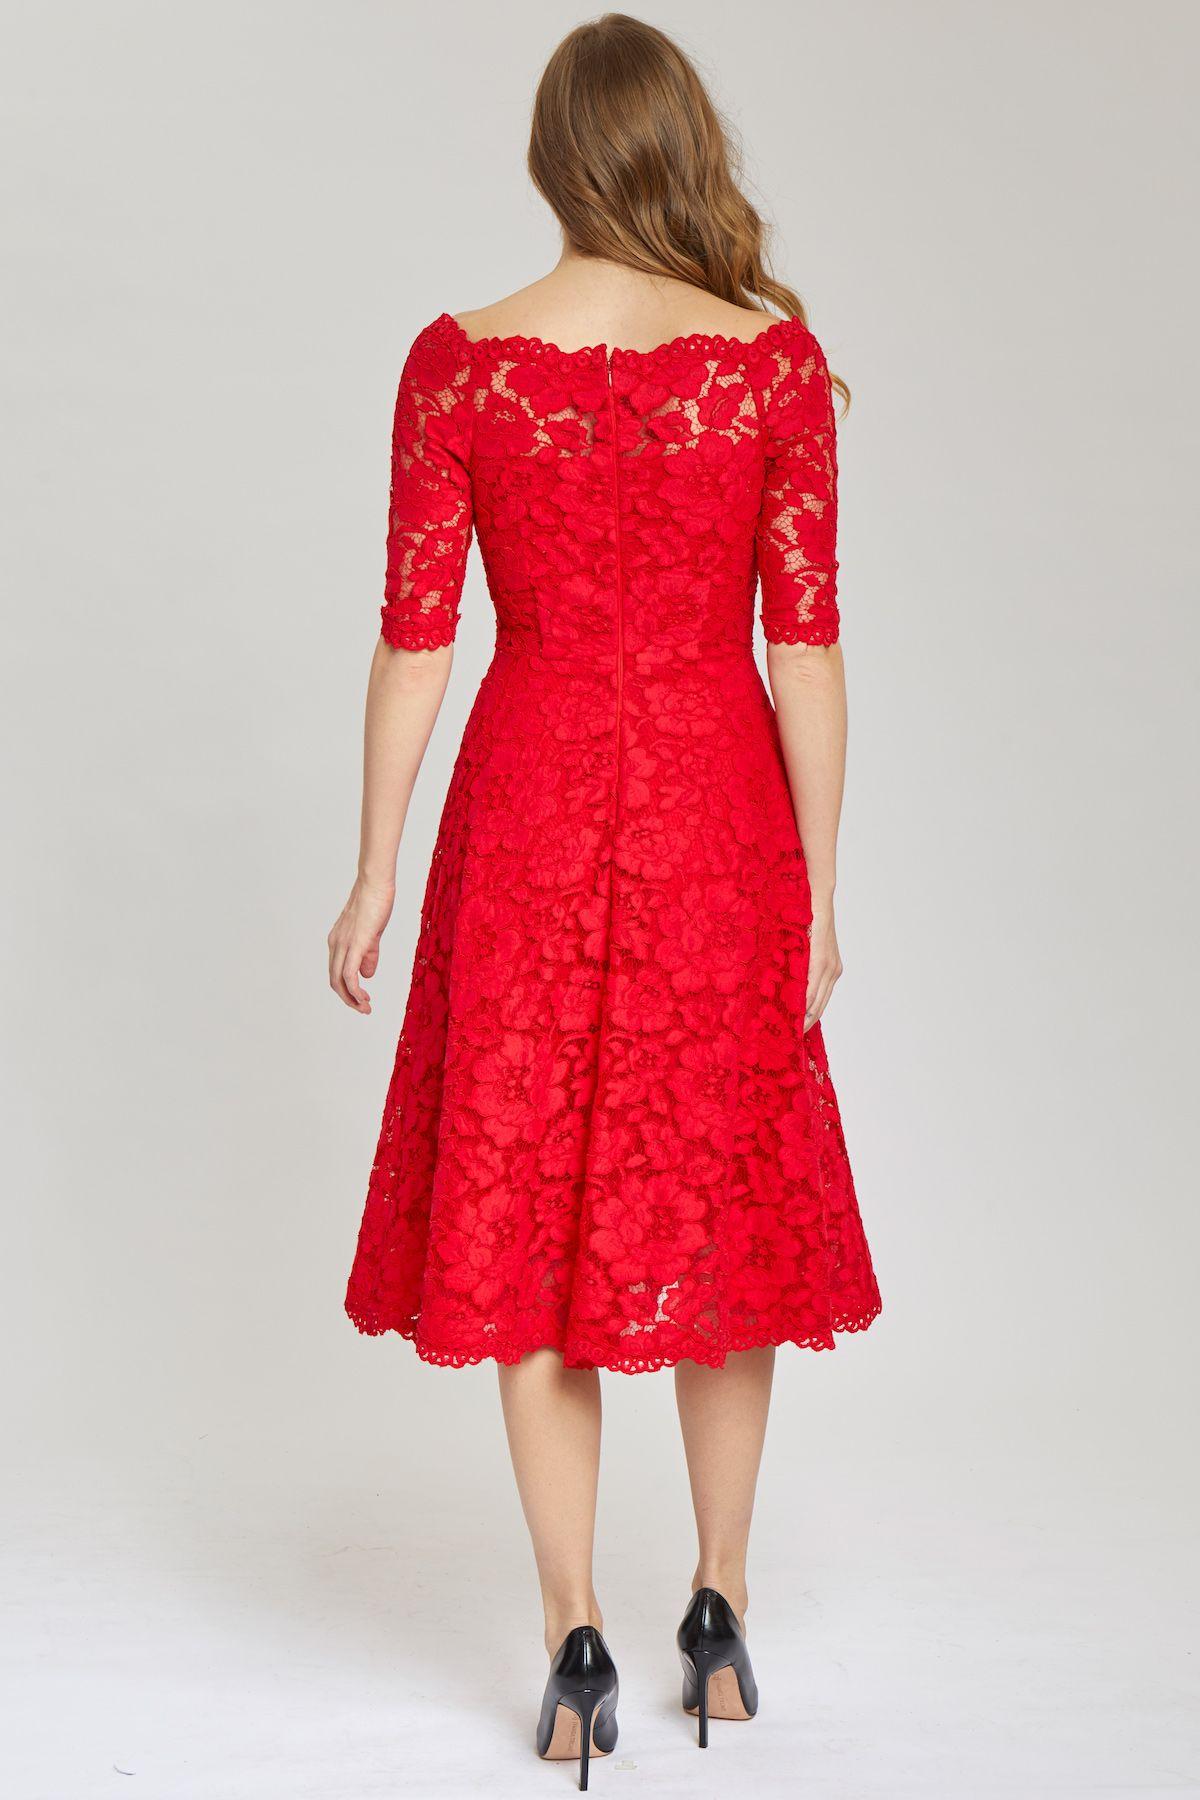 3 4 Sleeve Off The Shoulder Fit And Flare Tea Length Lace Dress Teri Jon Lace Tea Length Dress Dresses Lace Dress [ 1800 x 1200 Pixel ]